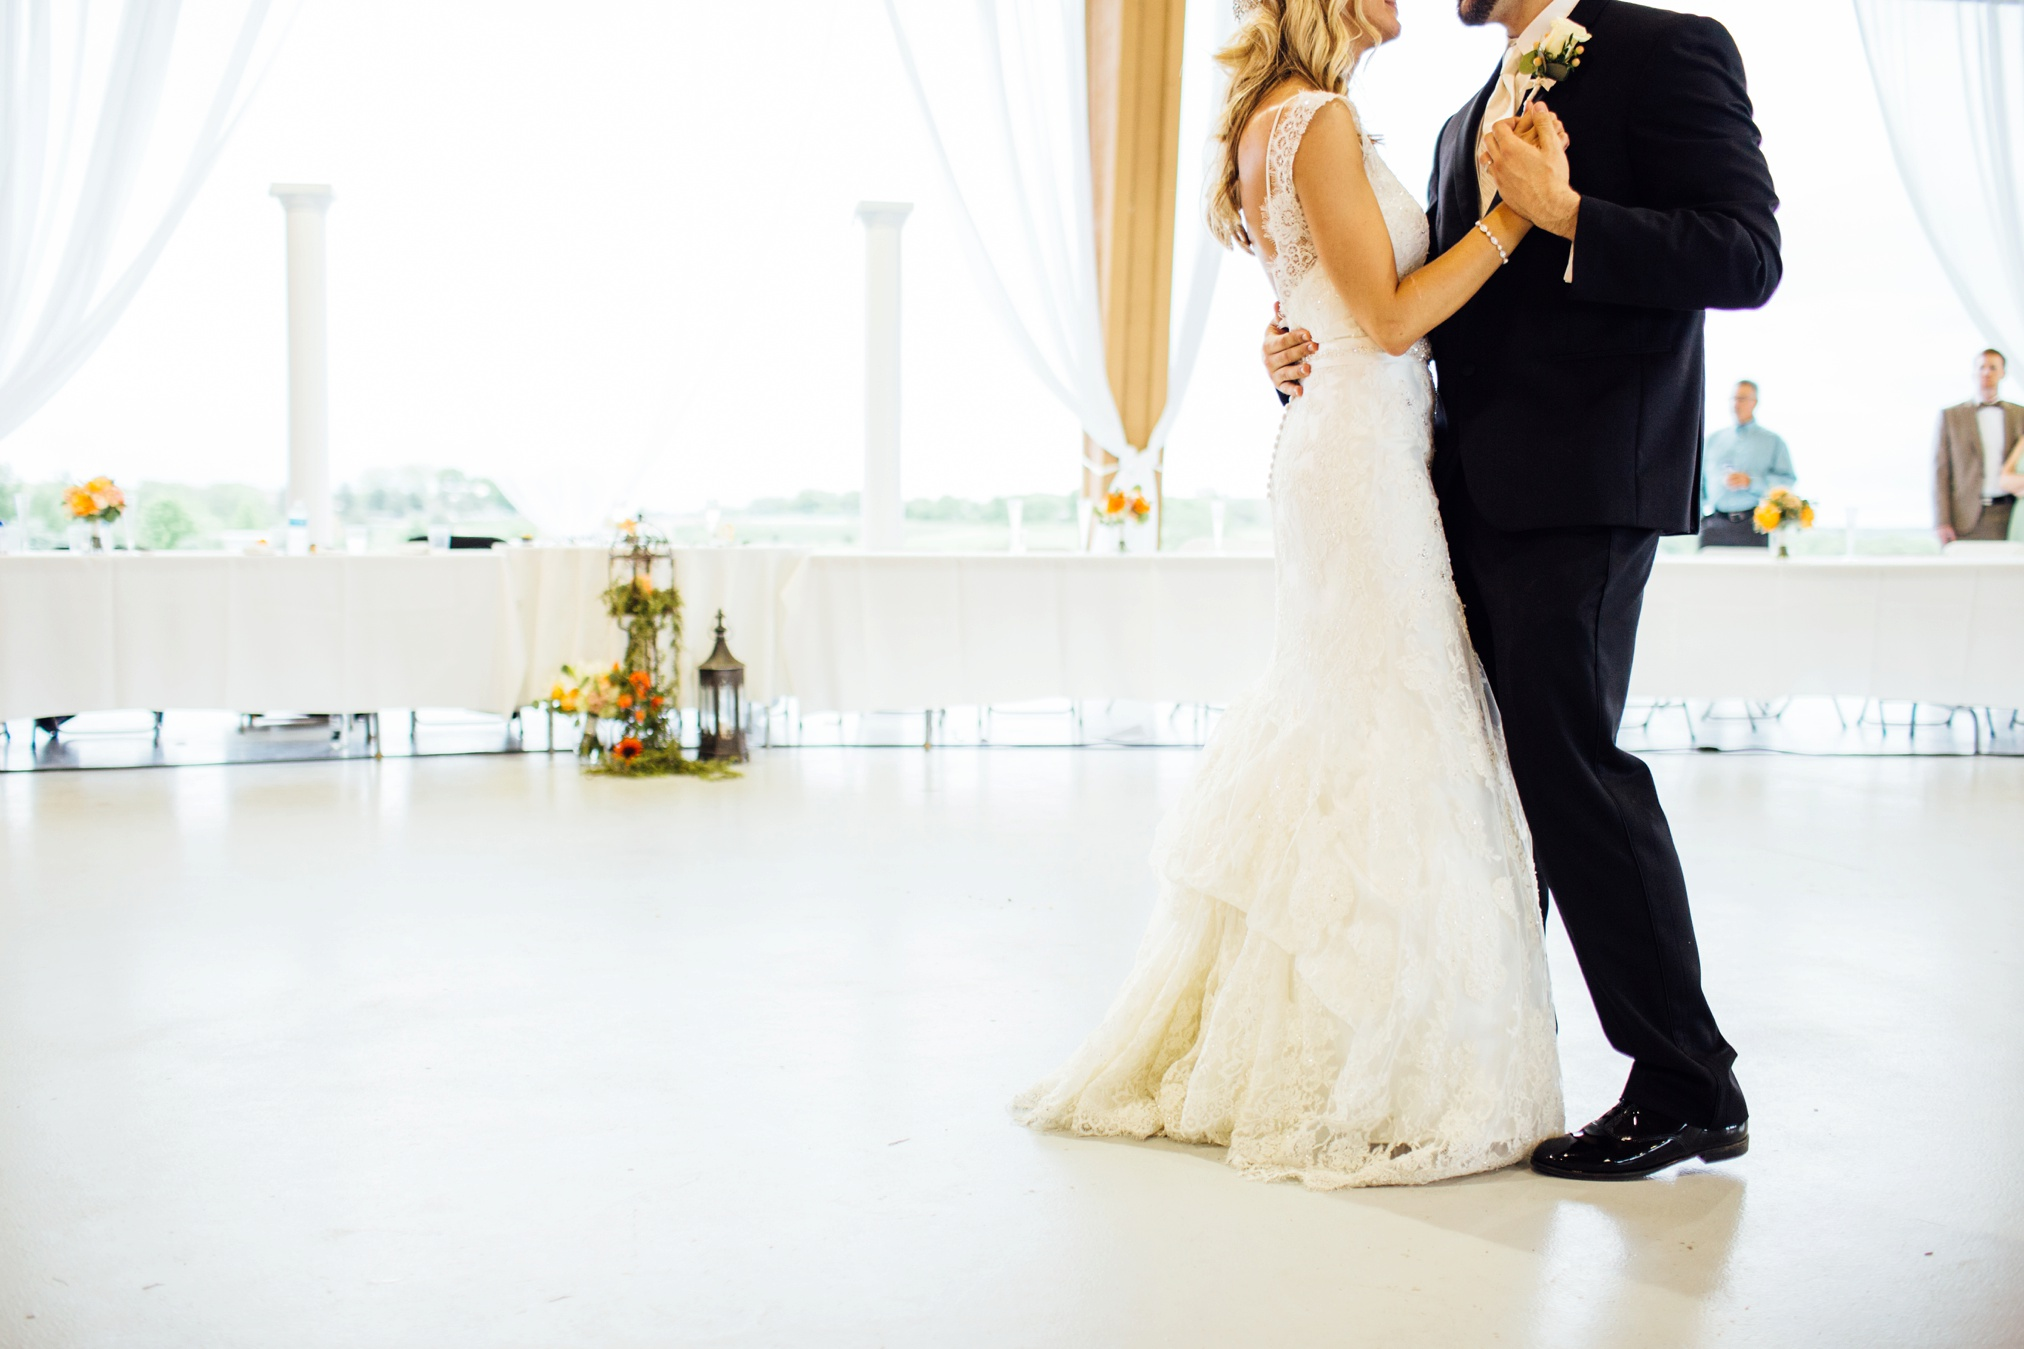 schmid_wedding-774.jpg